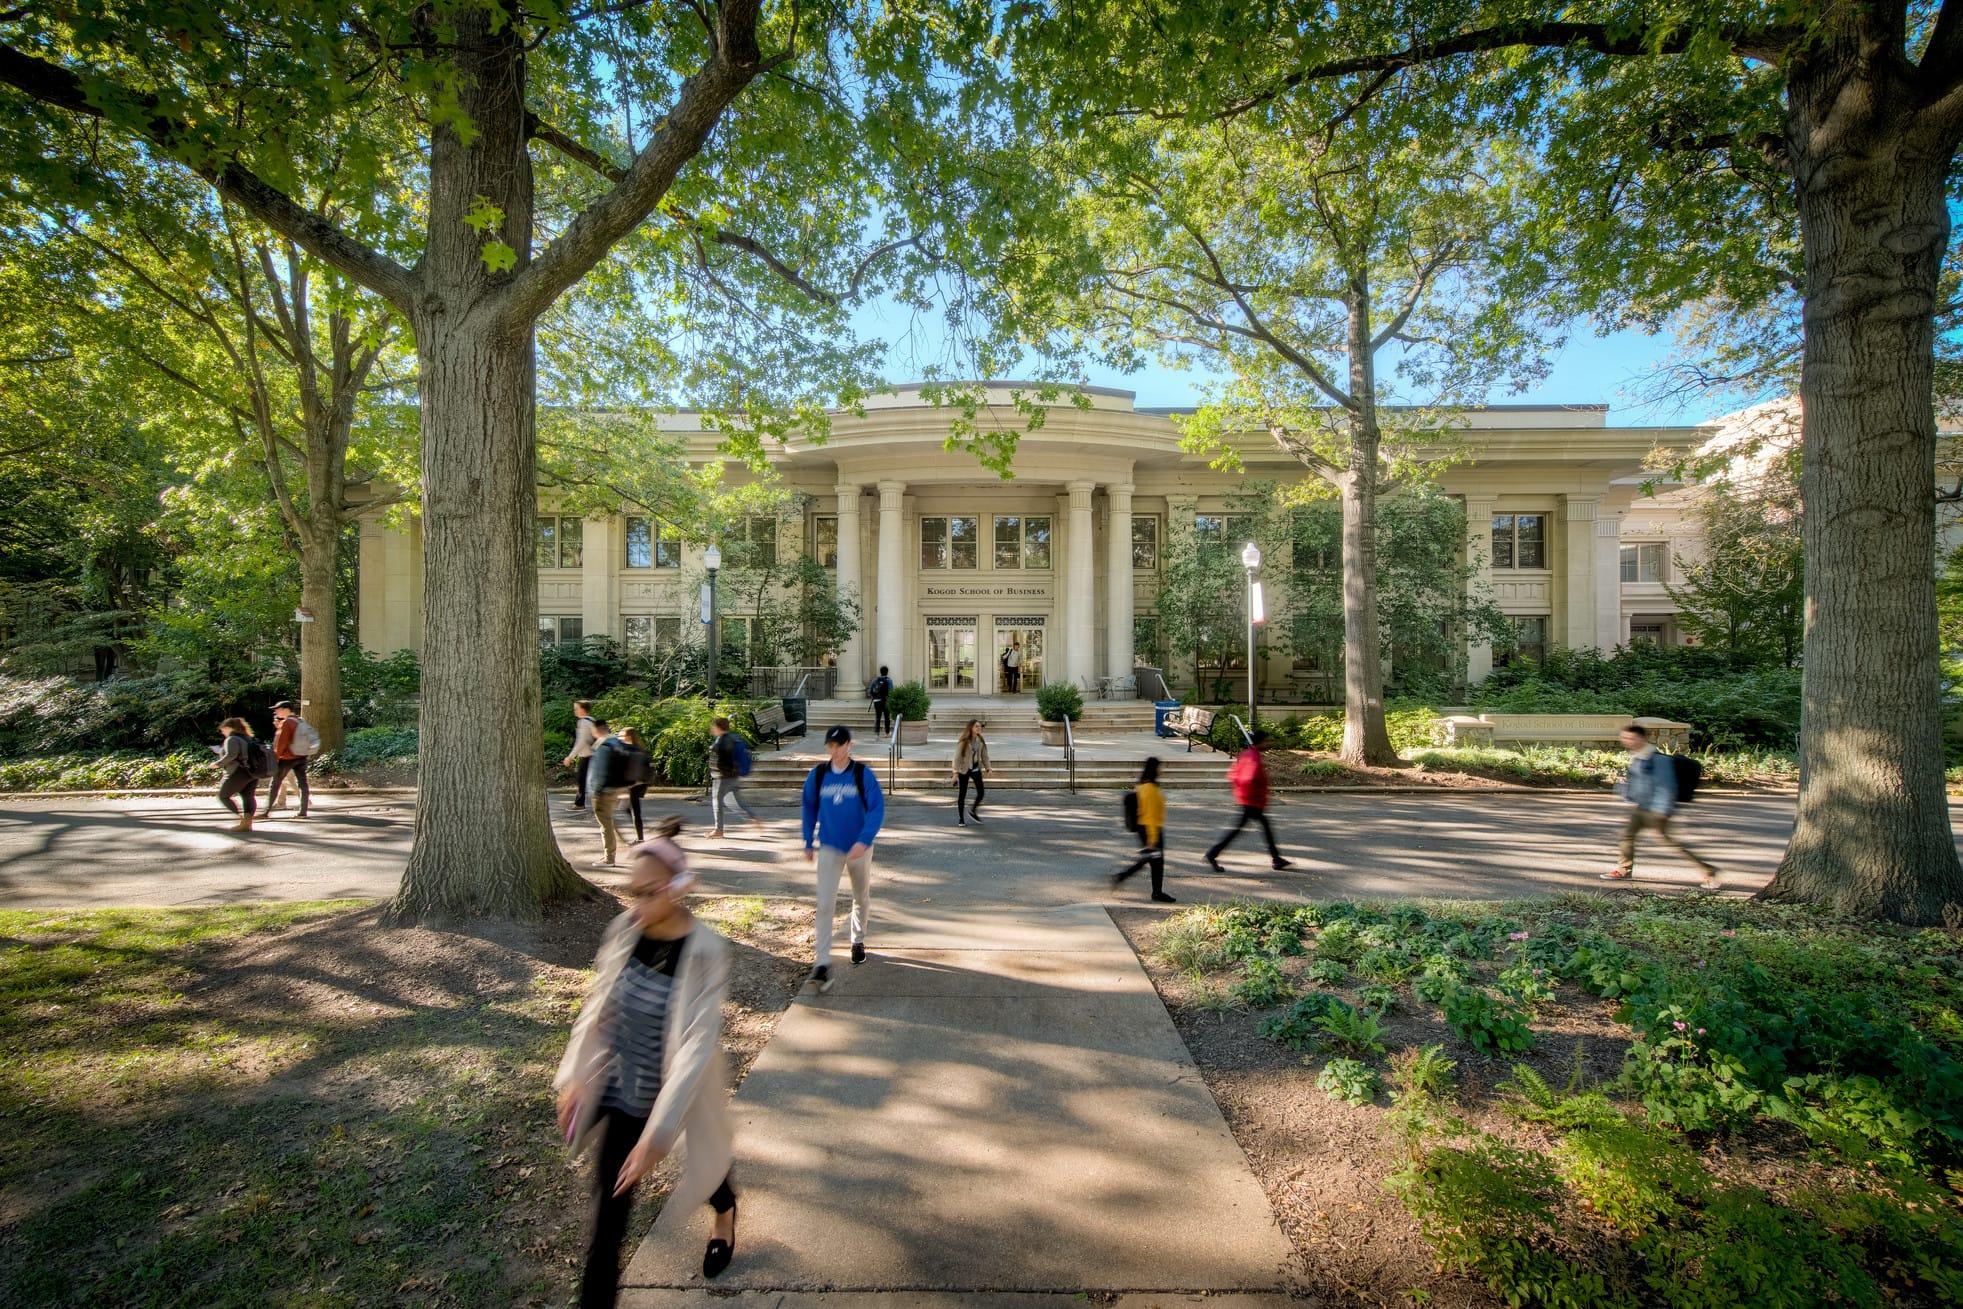 A US university